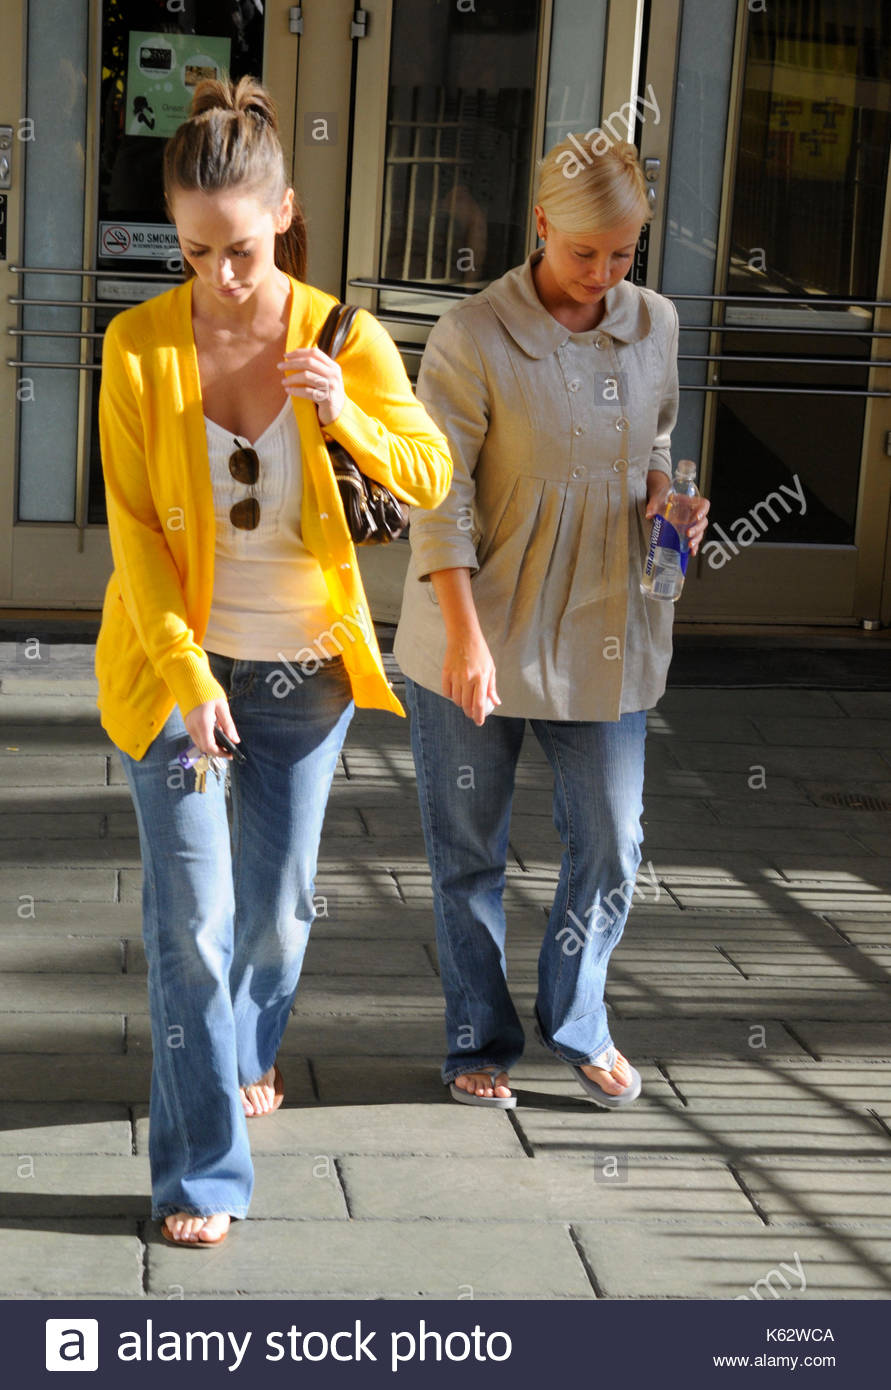 Jennifer Love Hewitt broke up with her fiance for money 03.02.2009 98